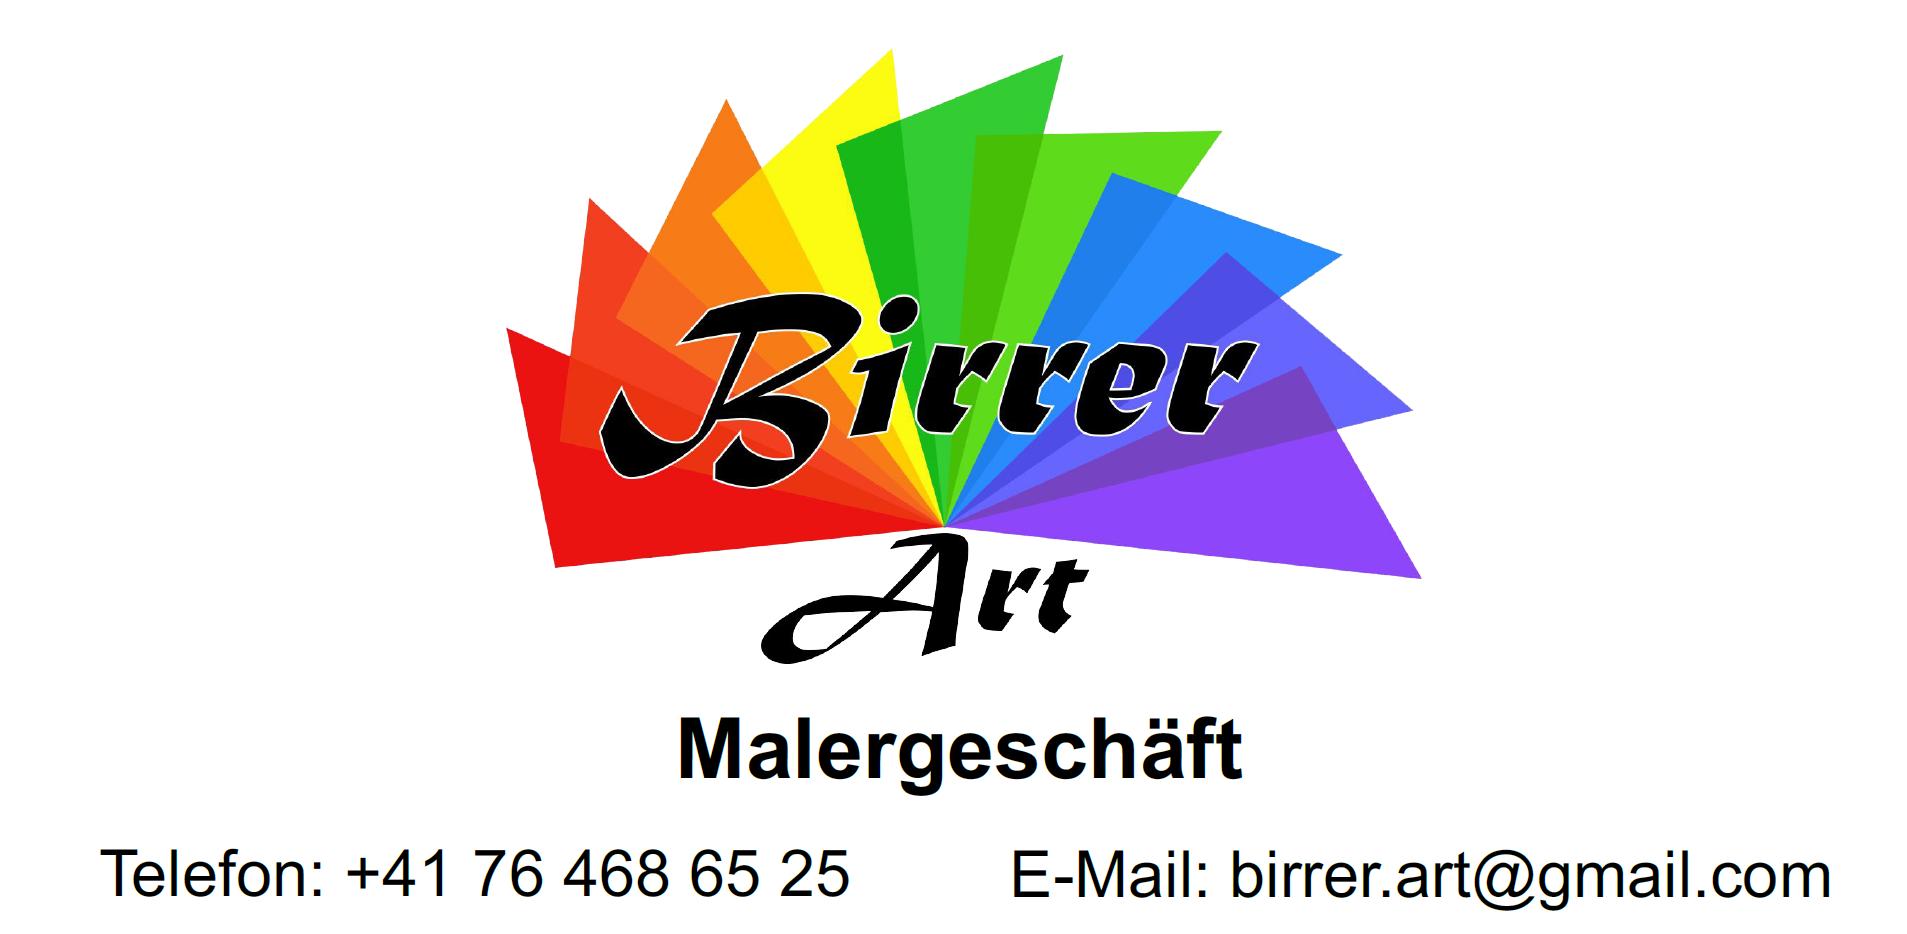 Birrer Art